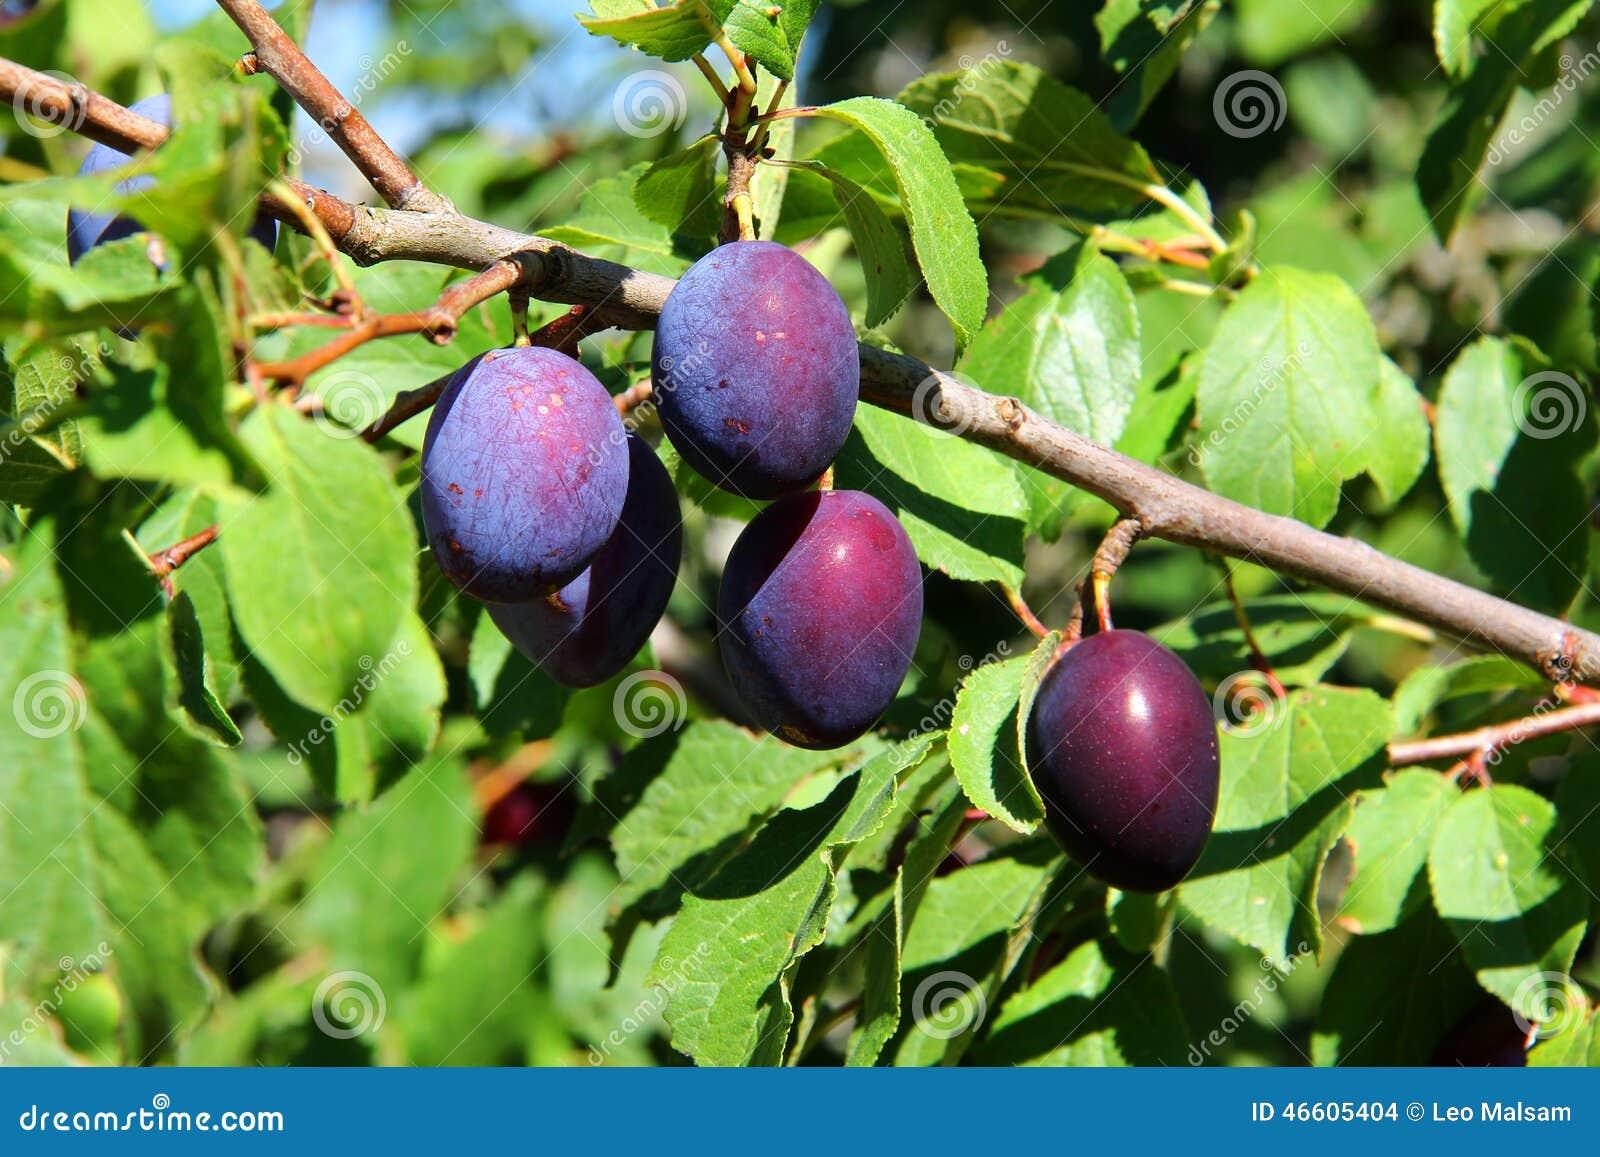 Fruits вал сливы